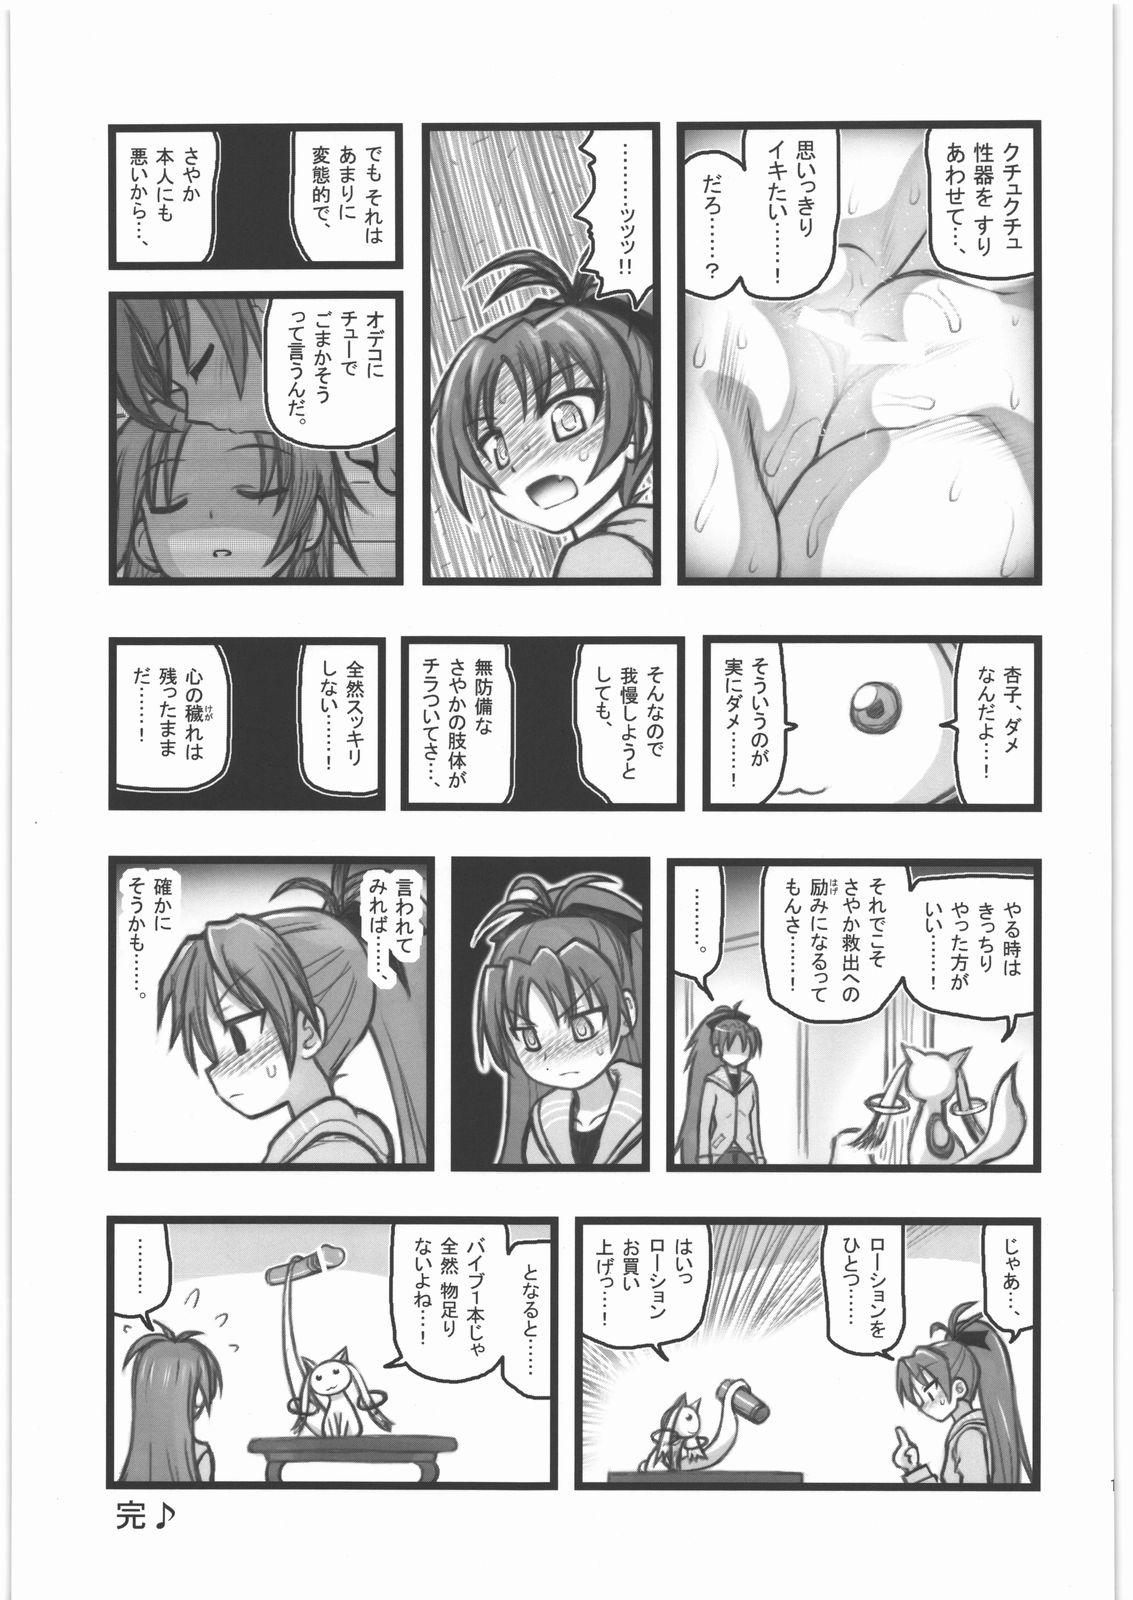 Ryoujoku Chara Box AR 11